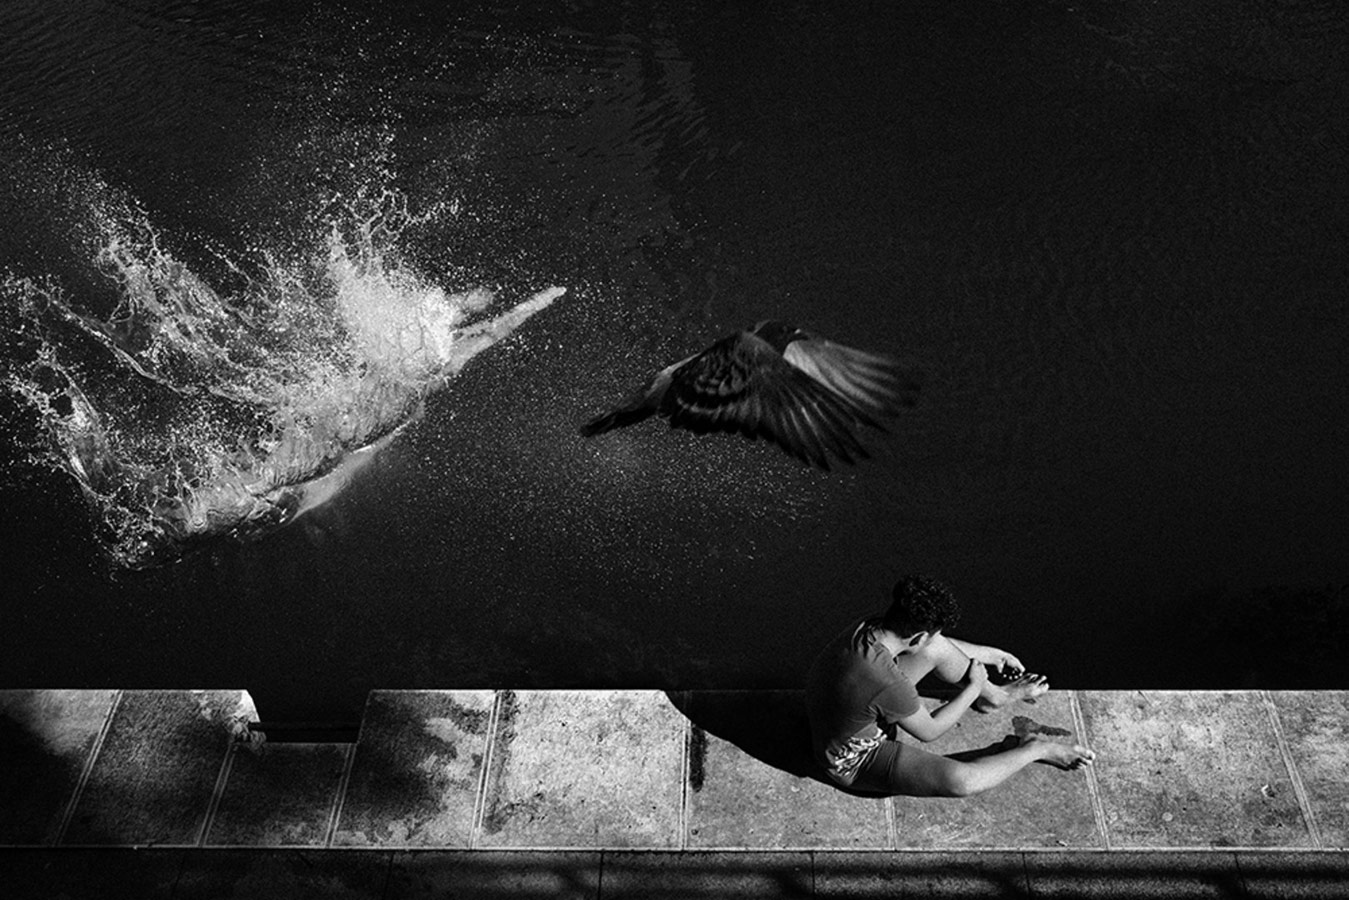 Untitled © Hugo Aymar, Documentary — Winner (Single), ASPA - Alghero Street Photography Awards